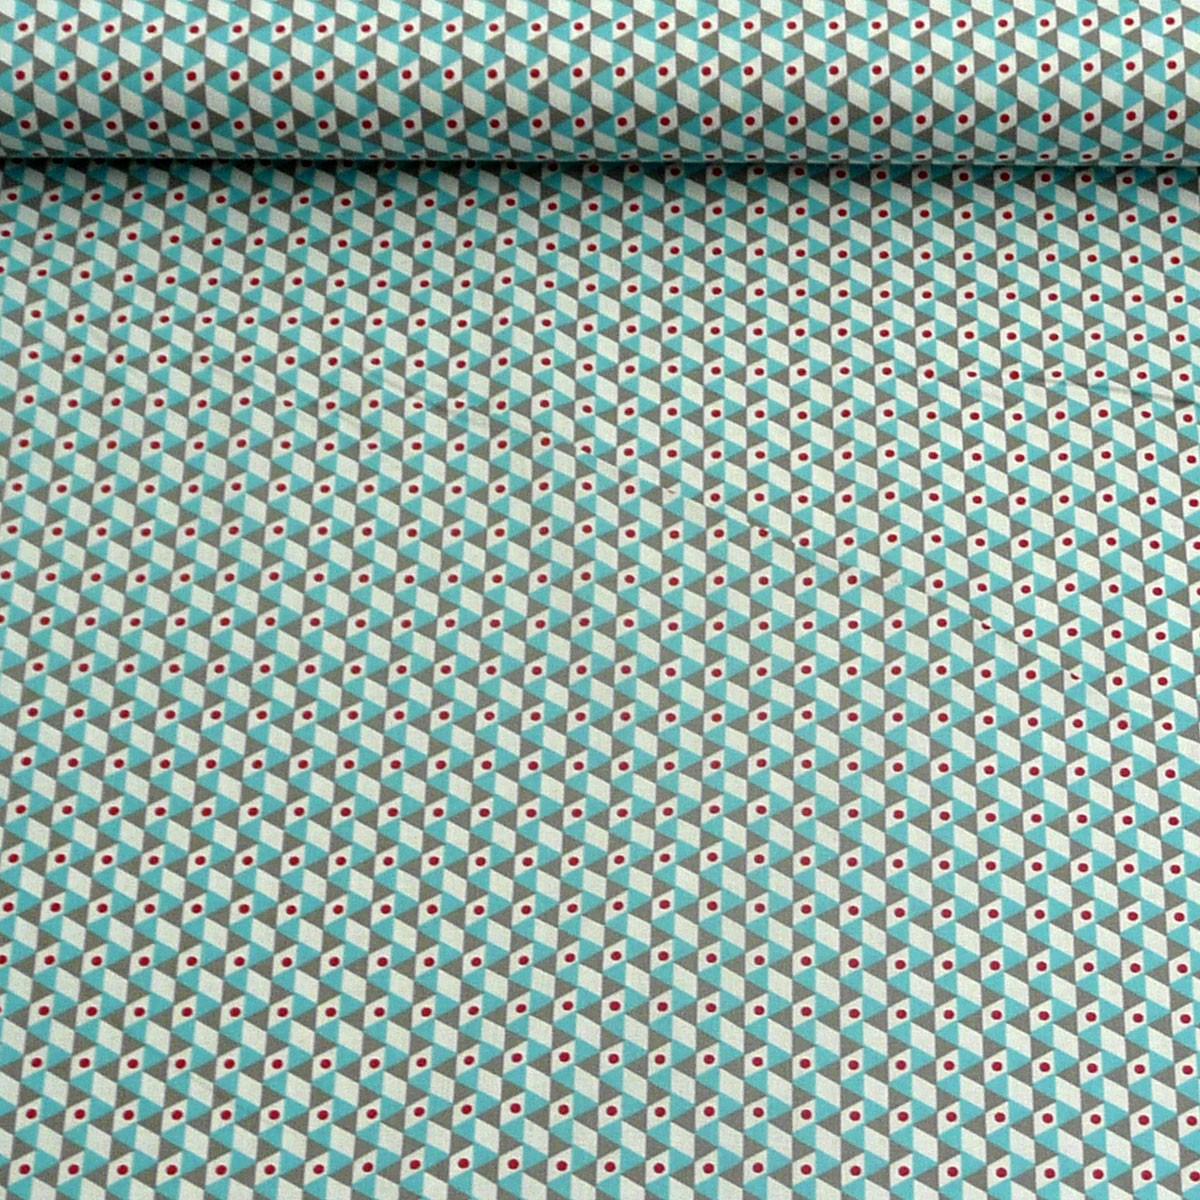 baumwollstoff stoff dreiecke wei grau t rkis rot alle stoffe stoffe gemustert stoff retro. Black Bedroom Furniture Sets. Home Design Ideas